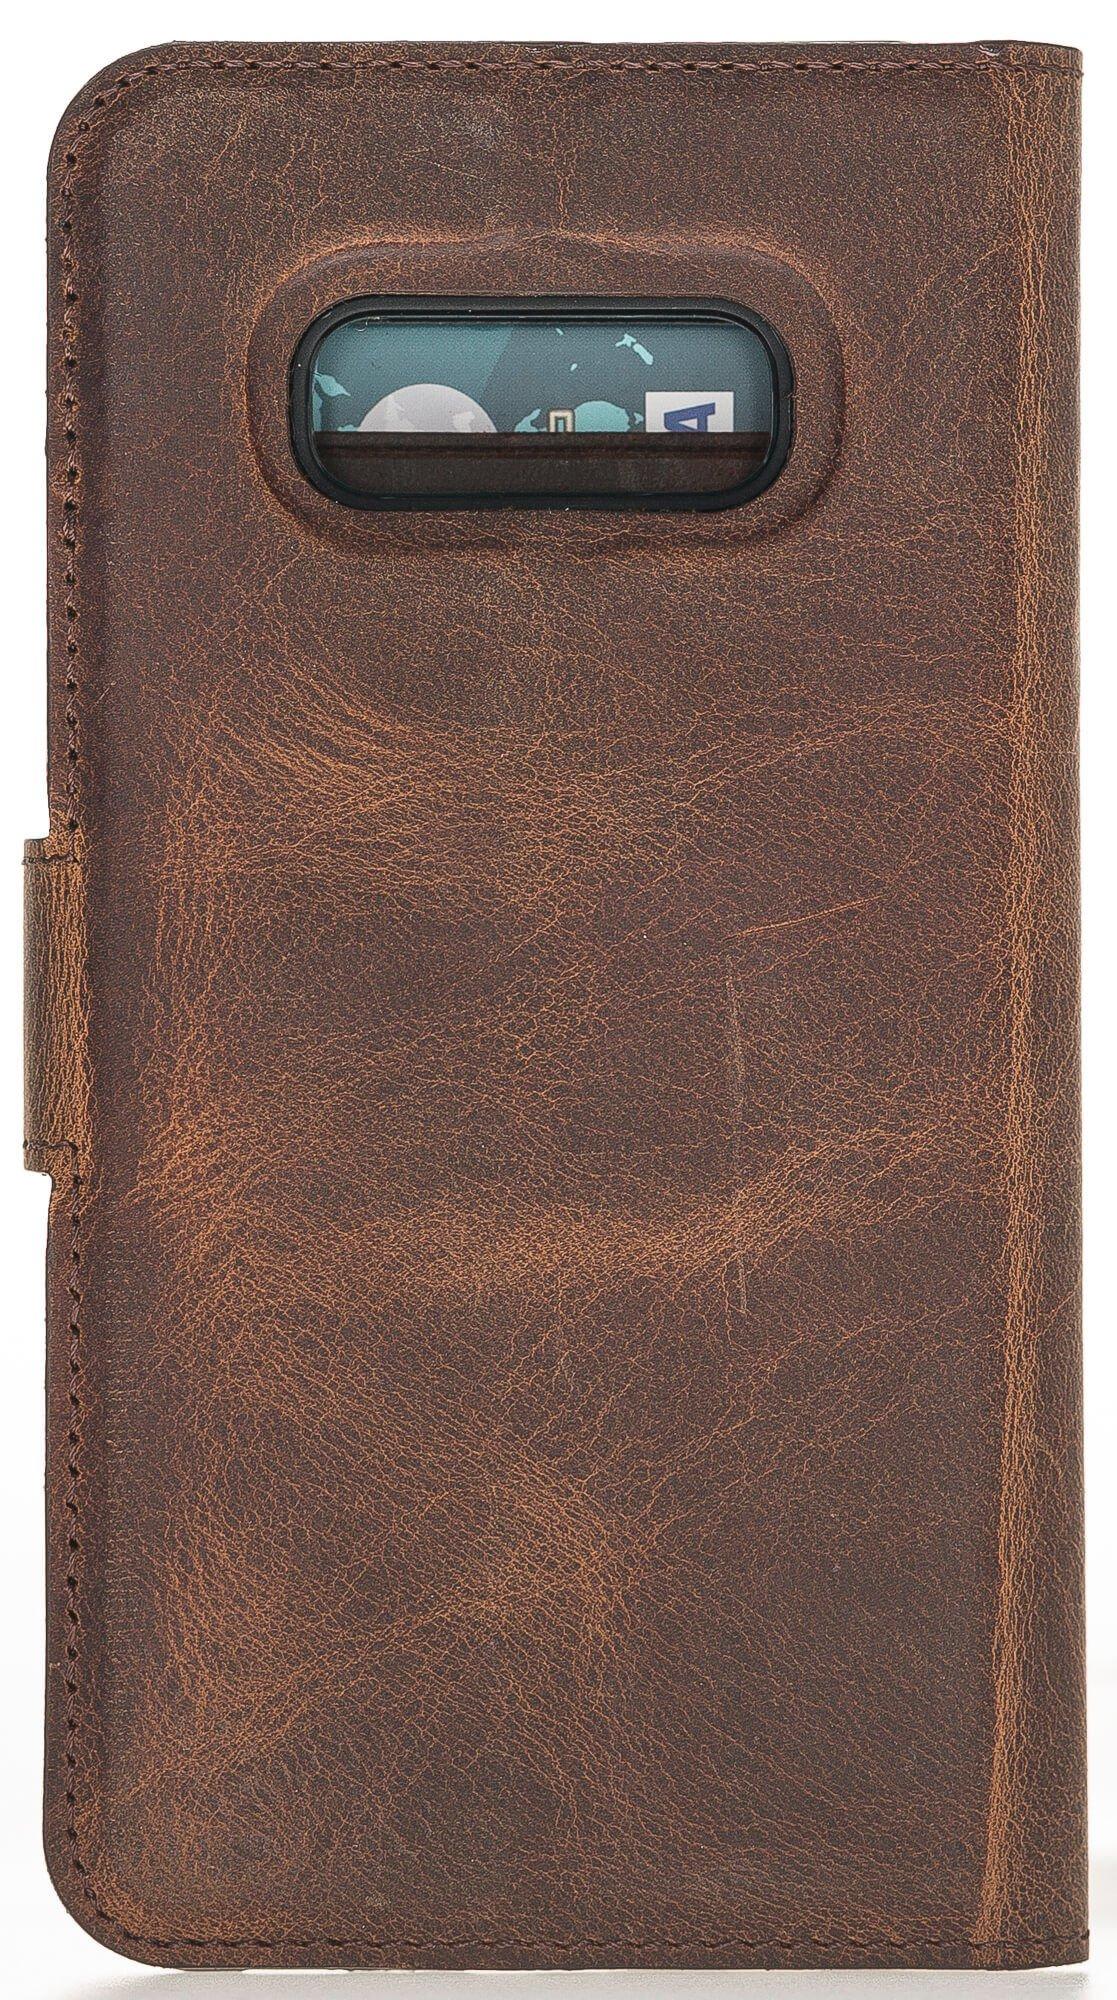 "Samsung S10e abnehmbare Lederhülle ""Harvard"" Leder Hülle Tasche Lederhülle Ledertasche  in Vintage Braun"